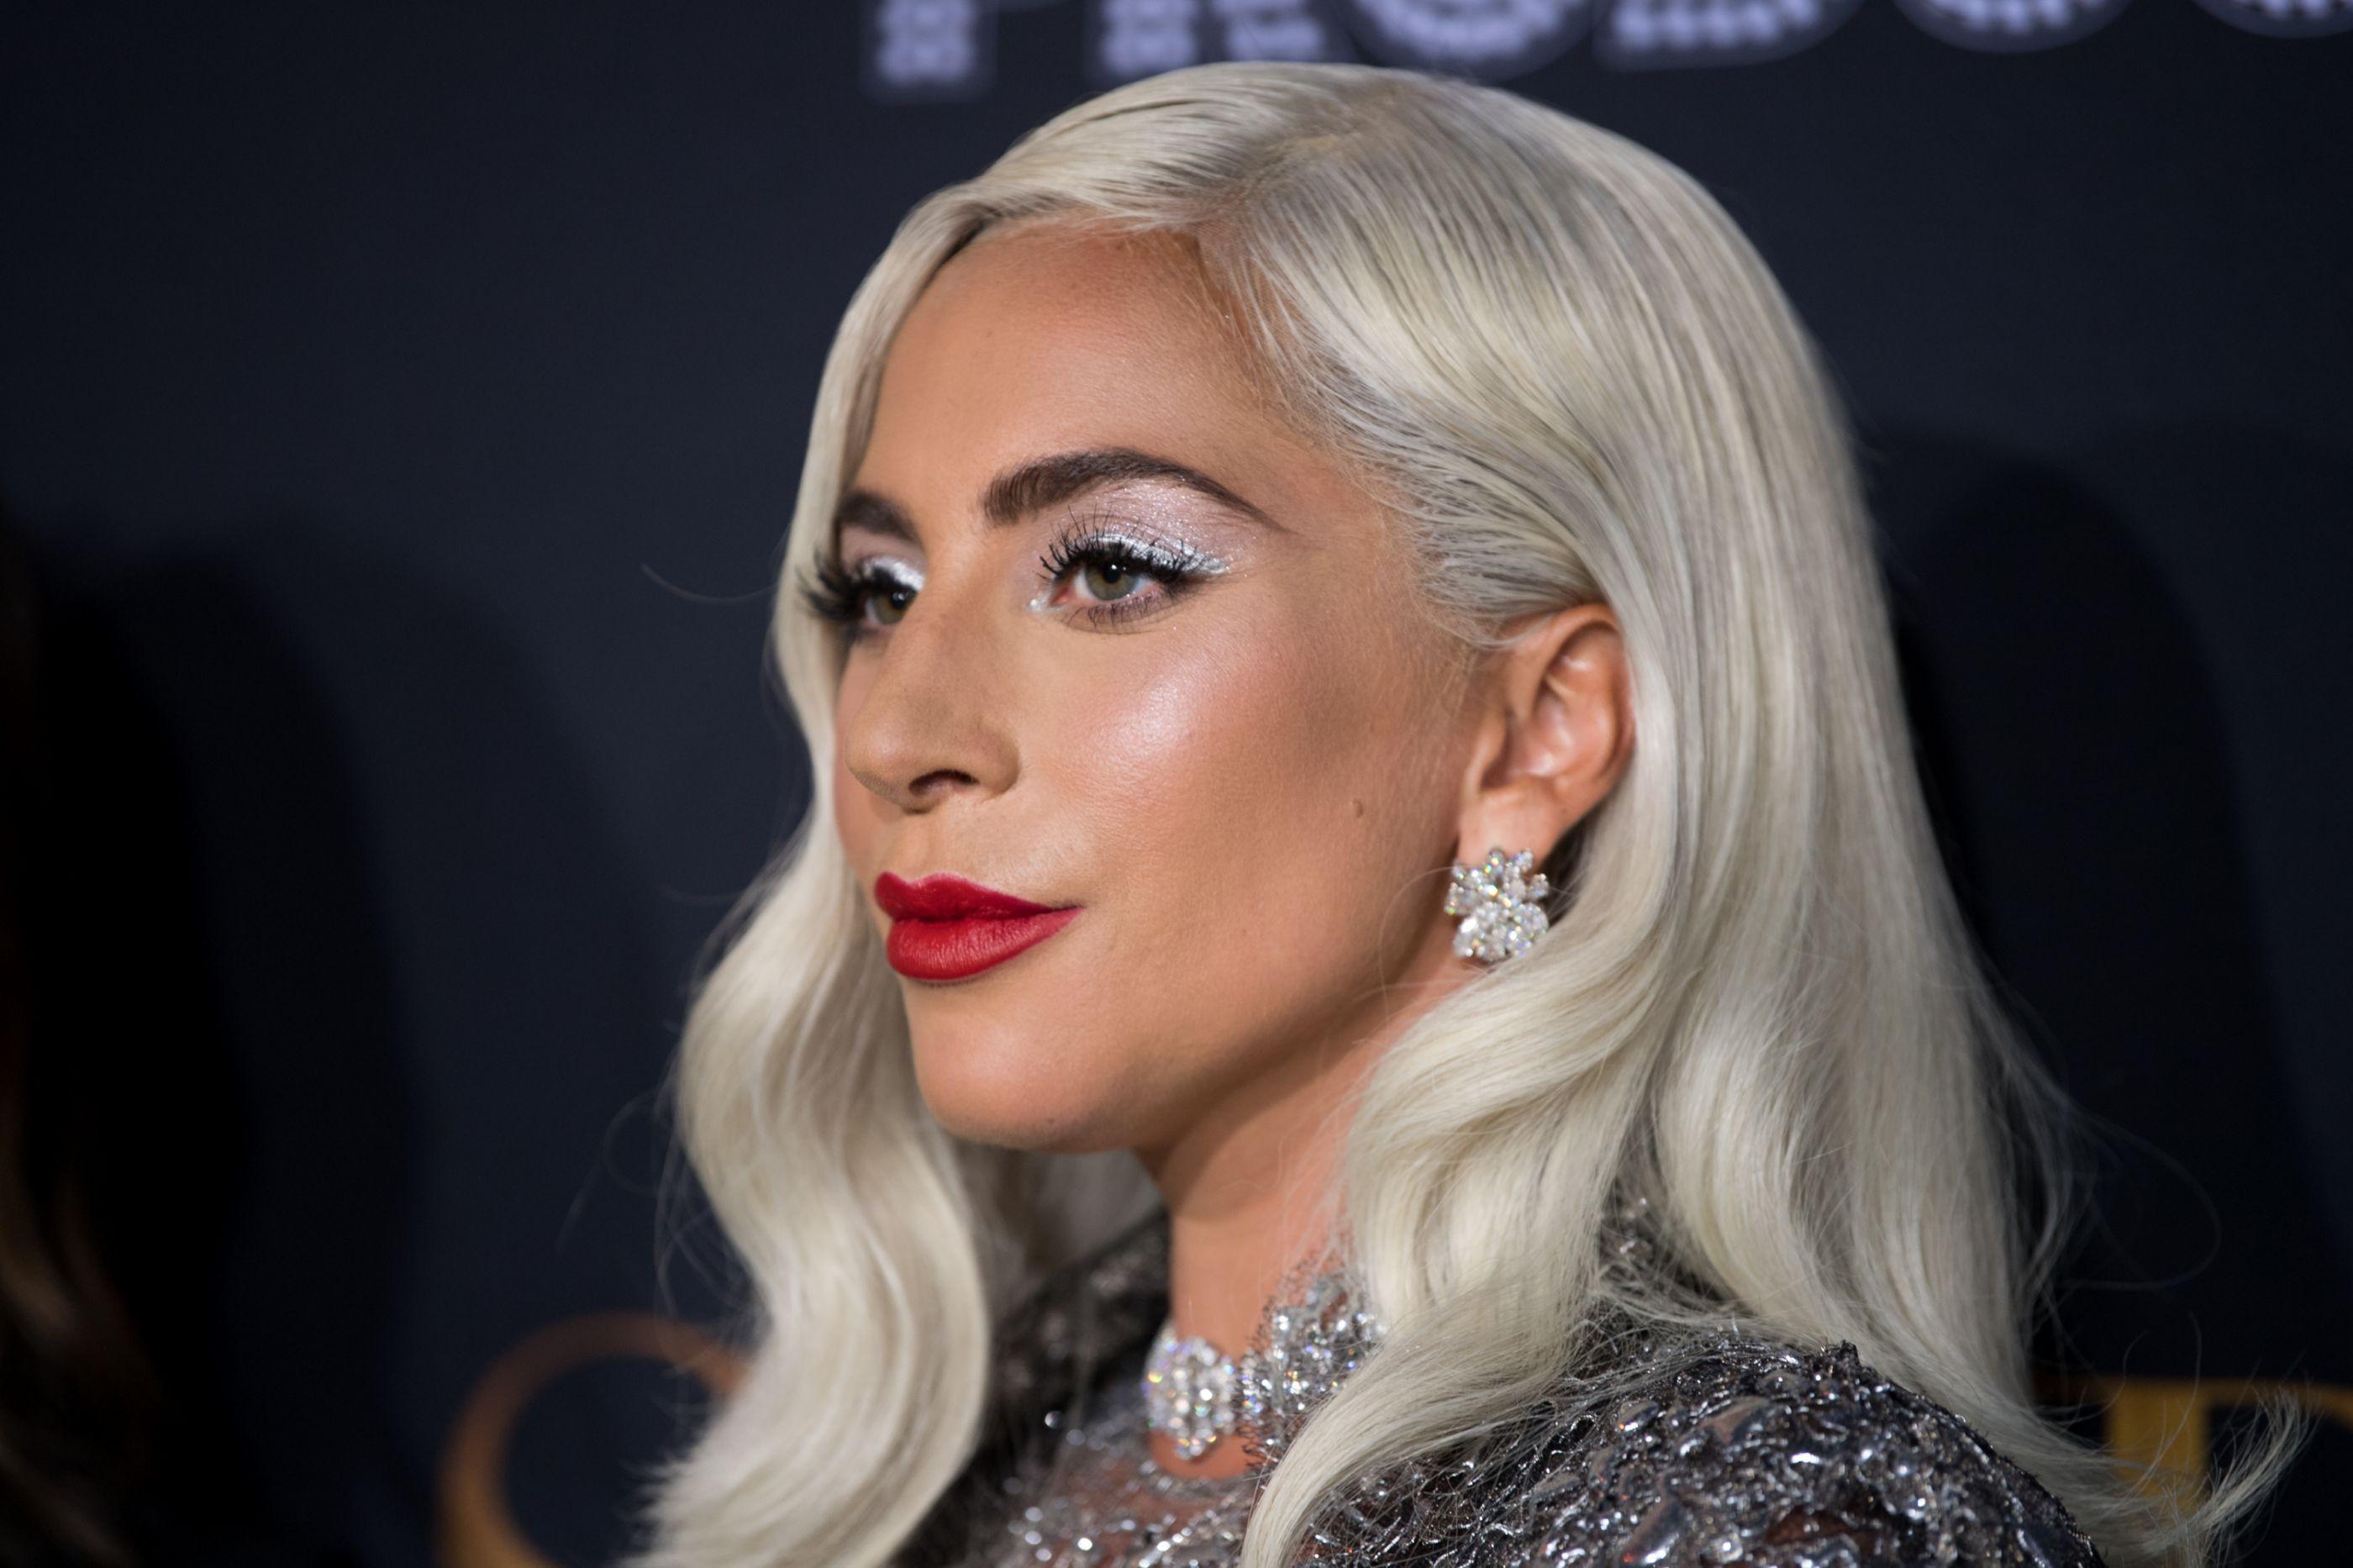 Ups! Look trai Lady Gaga e cantora mostra demais